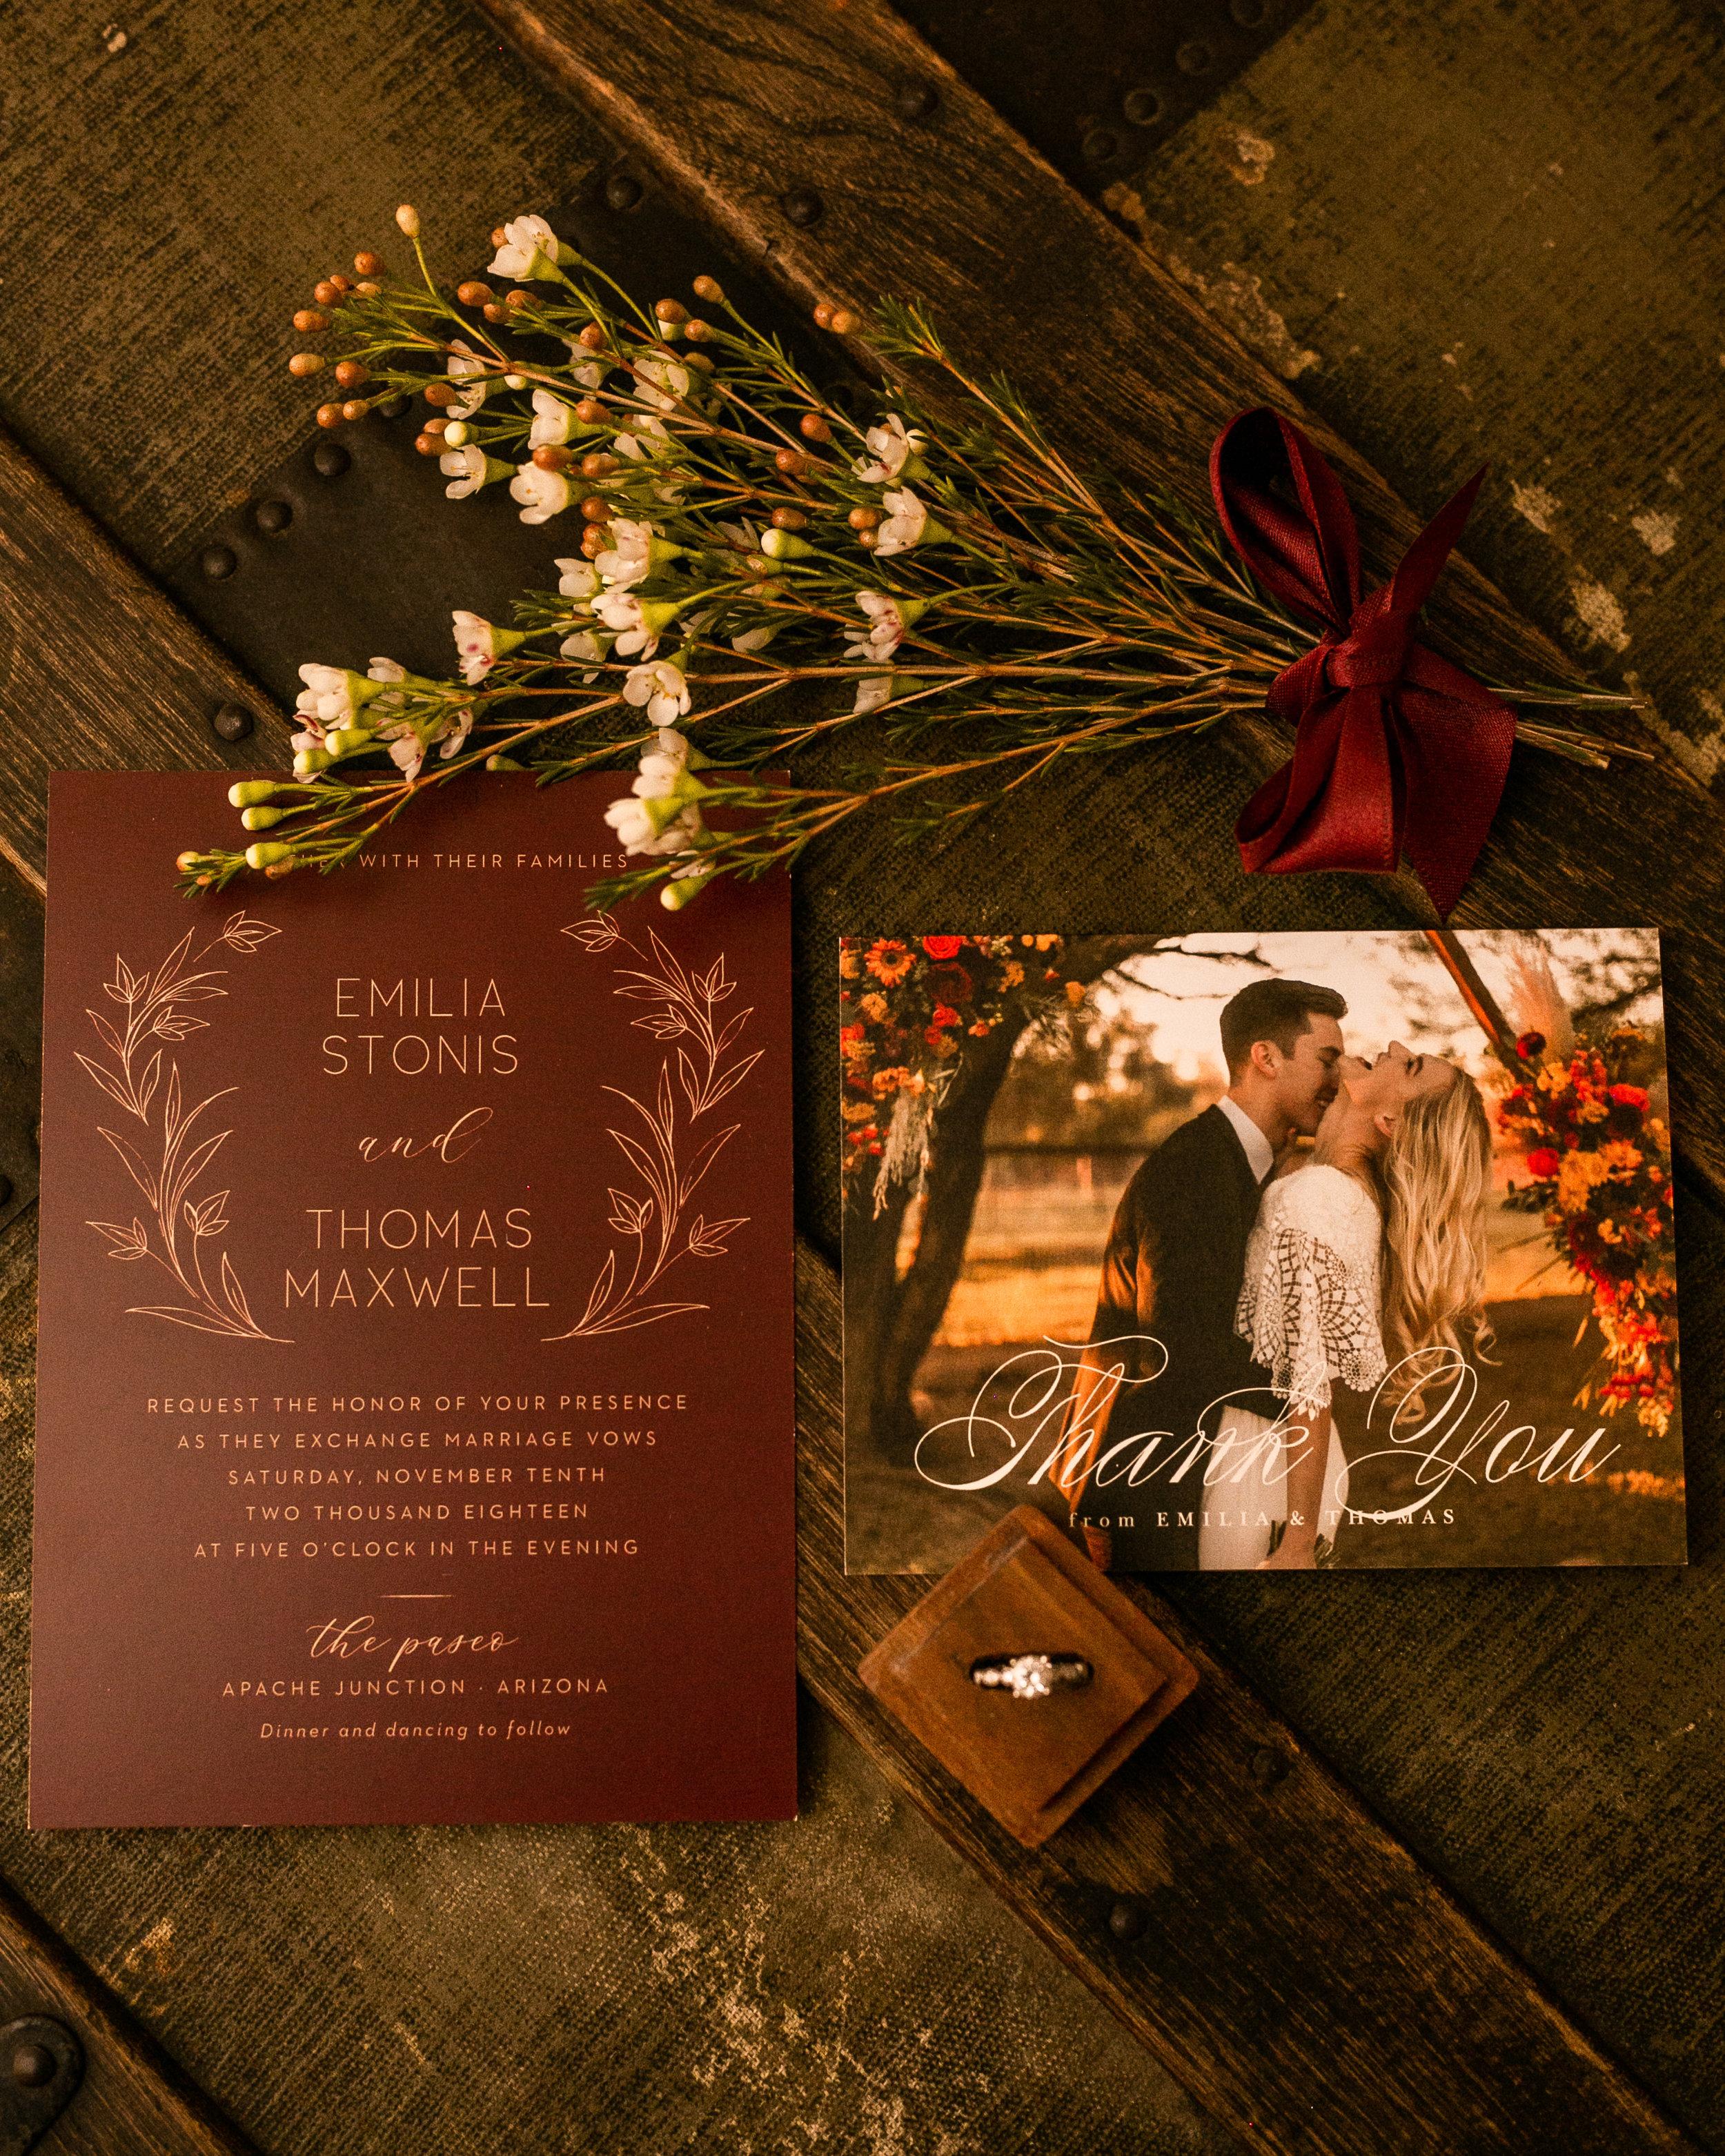 BASIC-INVITE-CUSTOM-WEDDING-INVITATIONS5.jpg